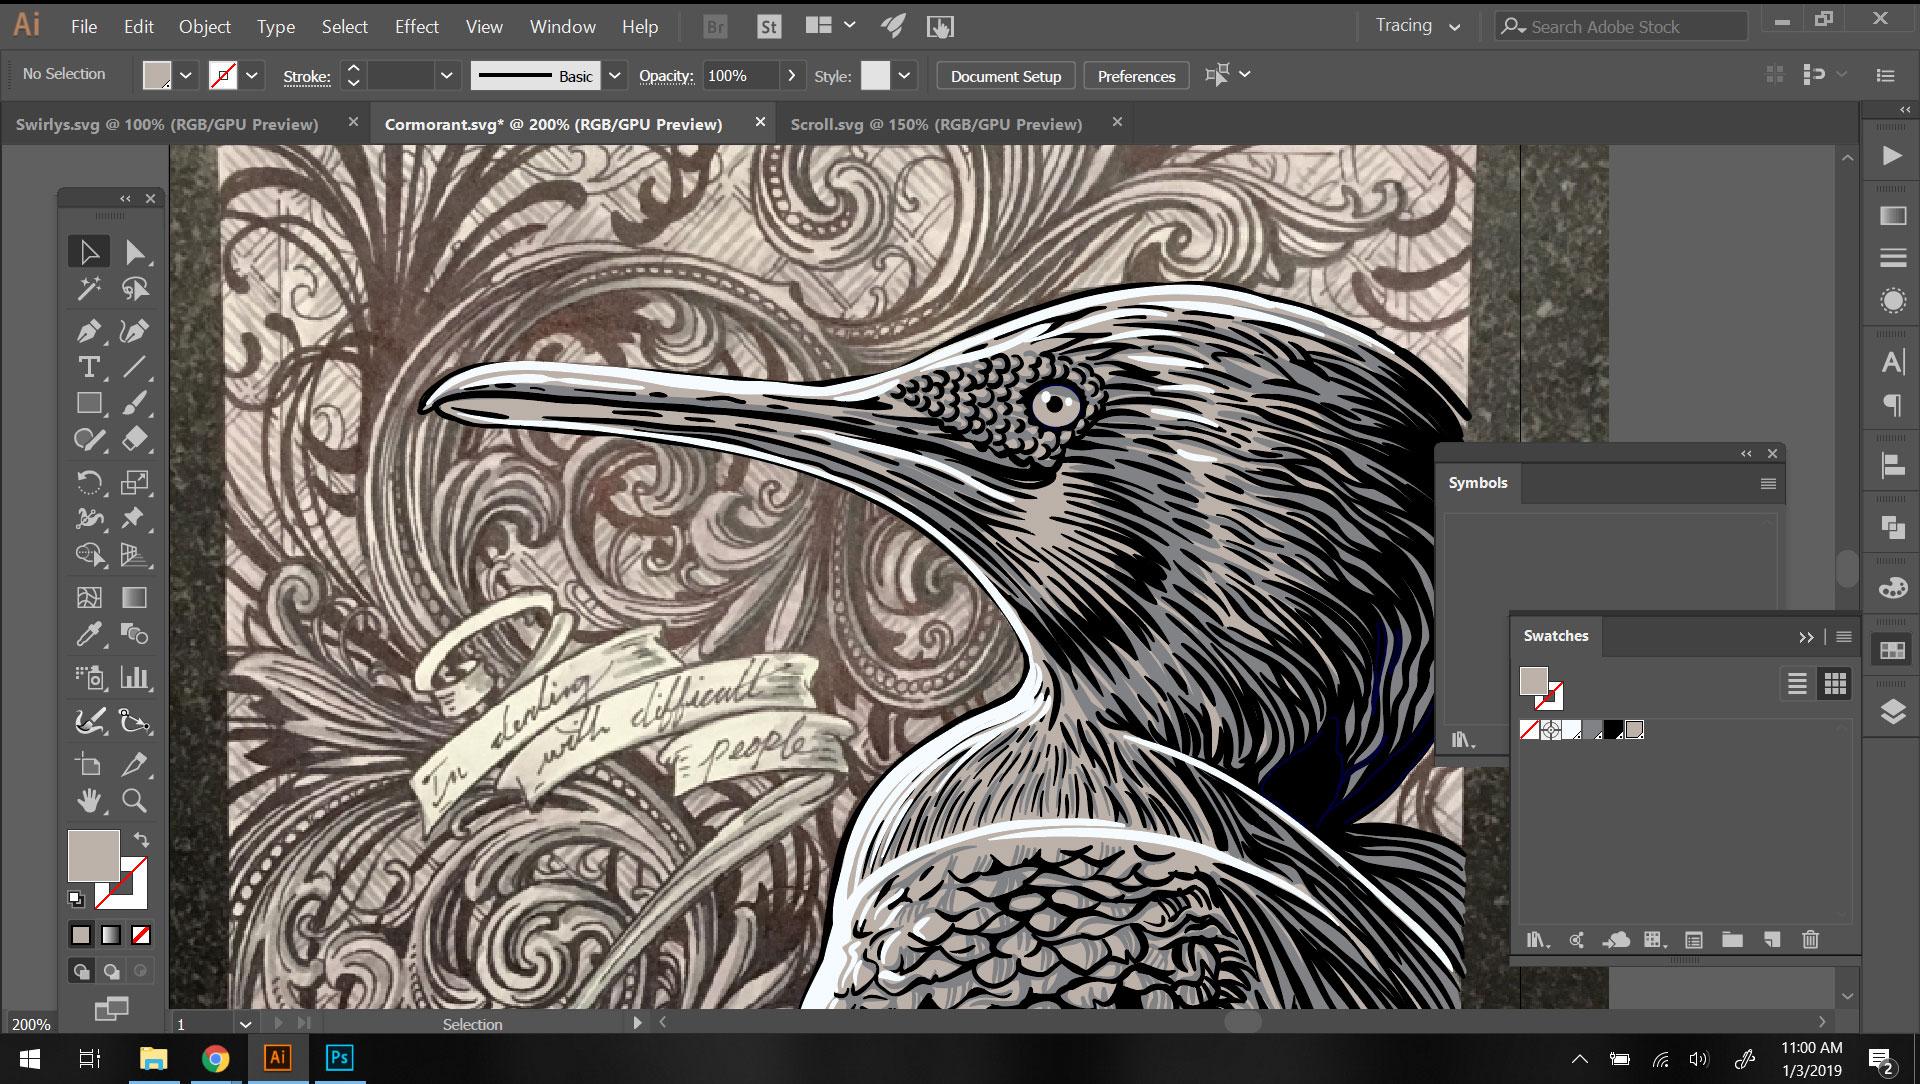 Screenshot in Adobe Illustrator of me vectorizing the Cormurant artwork